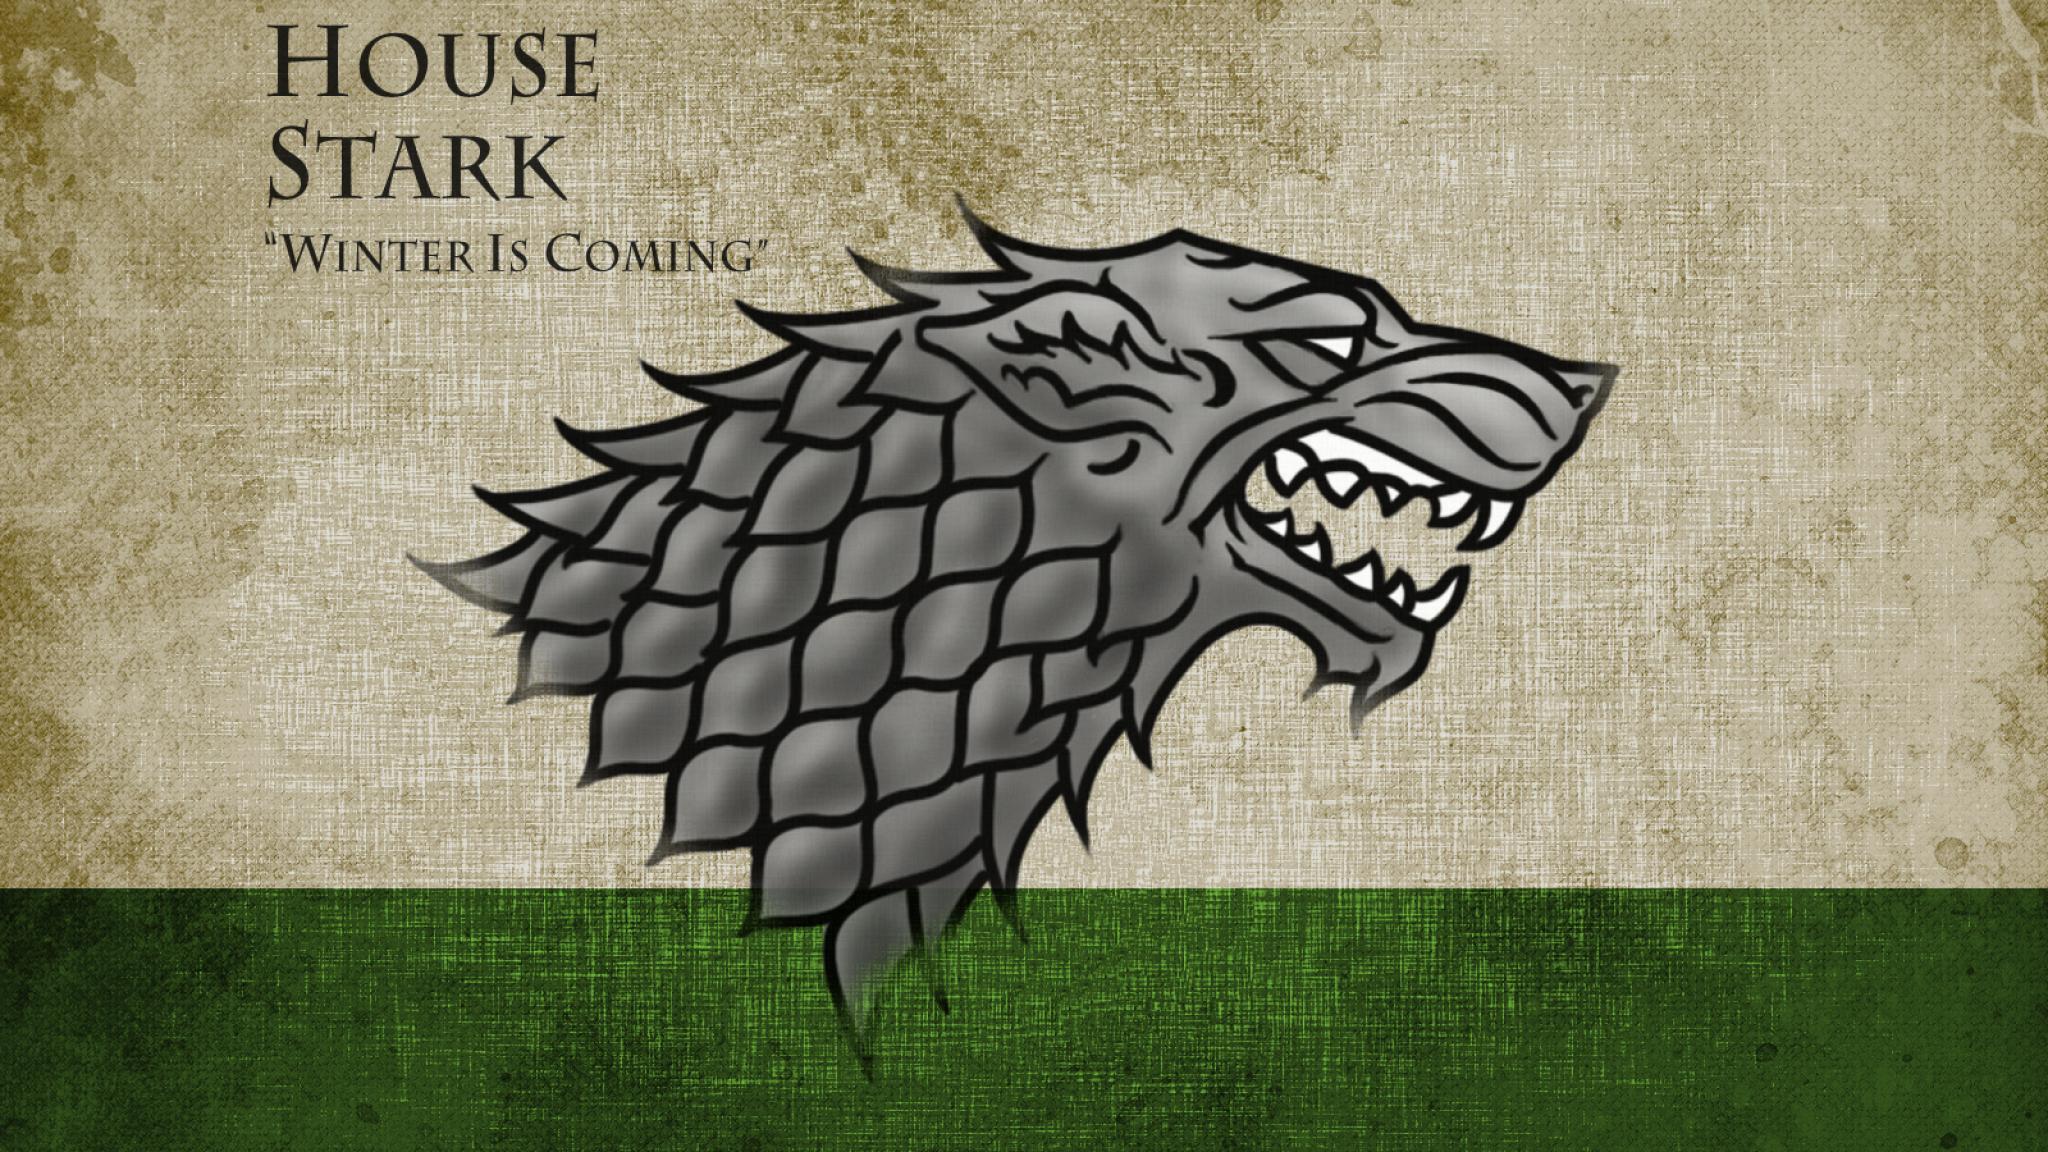 House Stark Game Of Thrones Photoshoot, Full HD Wallpaper